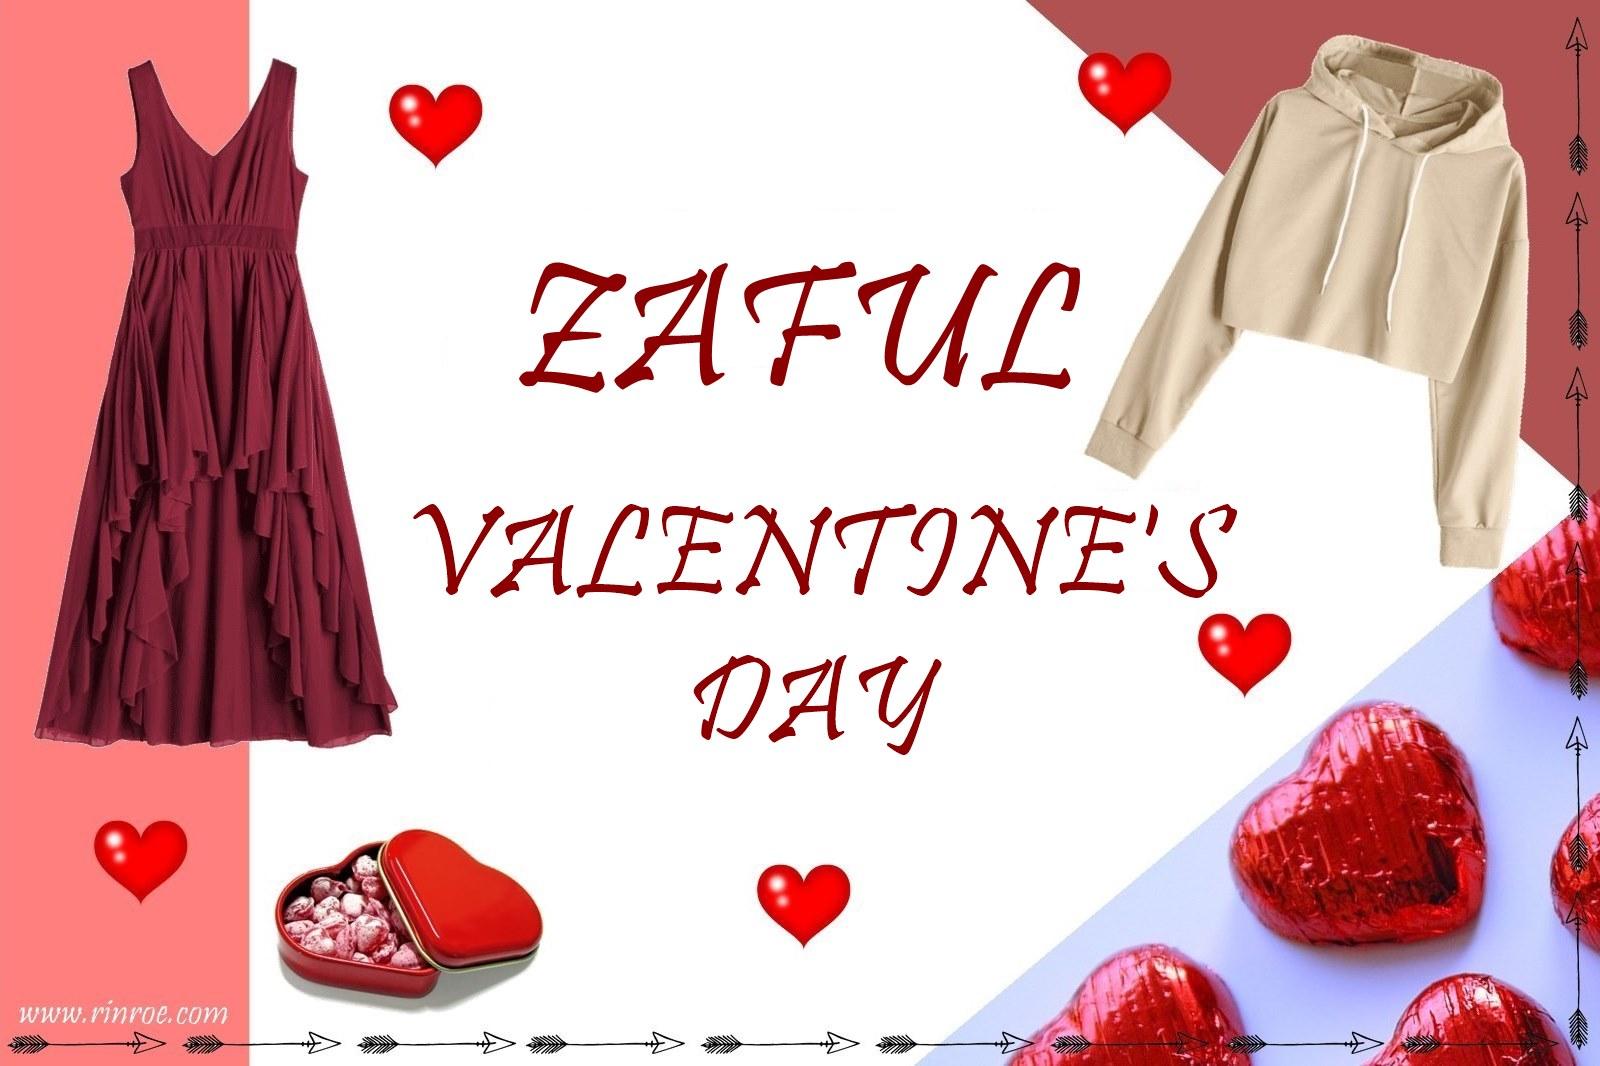 Zaful valentines day 2018